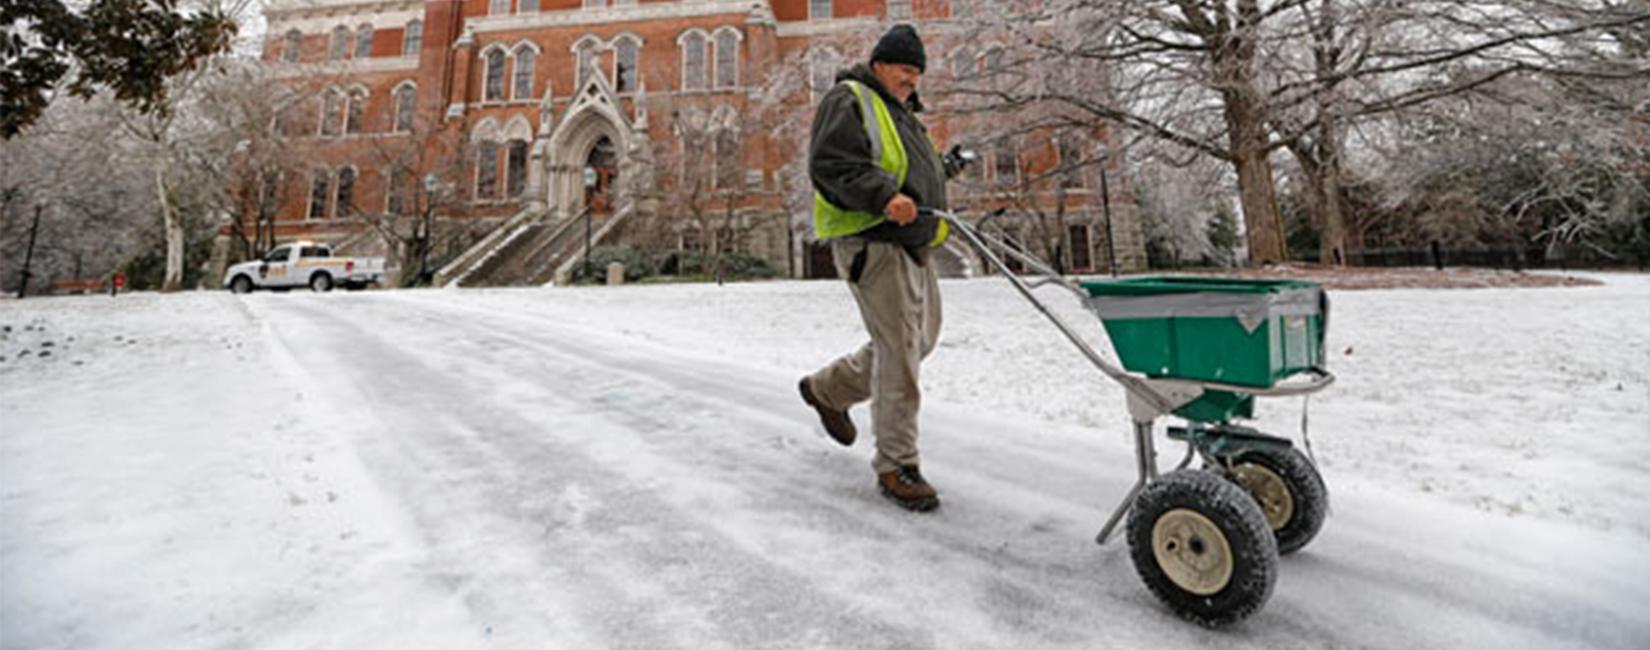 Vanderbilt University staff spreading salt on snow walkway.